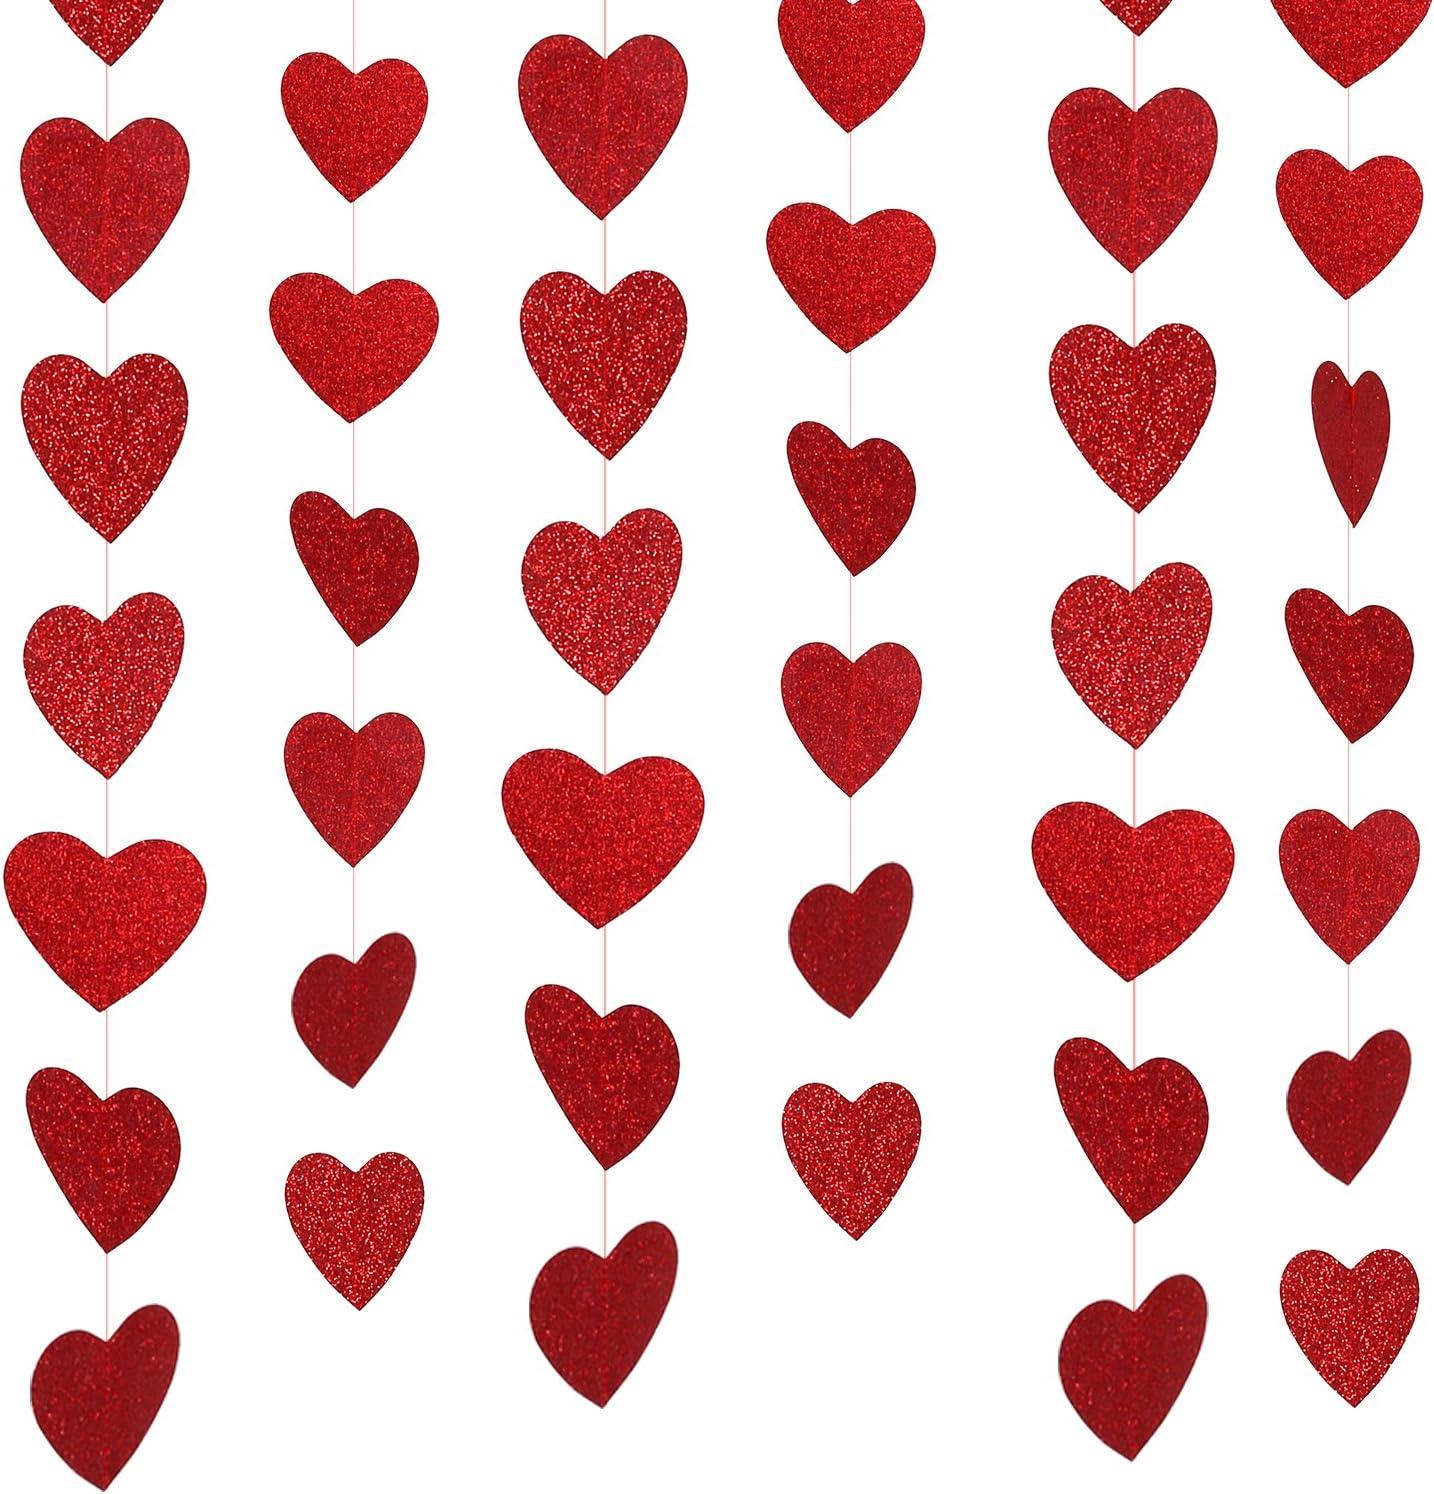 Valentine Day Decor, Konsait Valentine Hearts Decorations Garland(39.37FT, 57Hearts) Glitter Hanging String Valentine Accessories for Valentine's Day,Anniversaries,Wedding Backdrop Bridal Shower Party